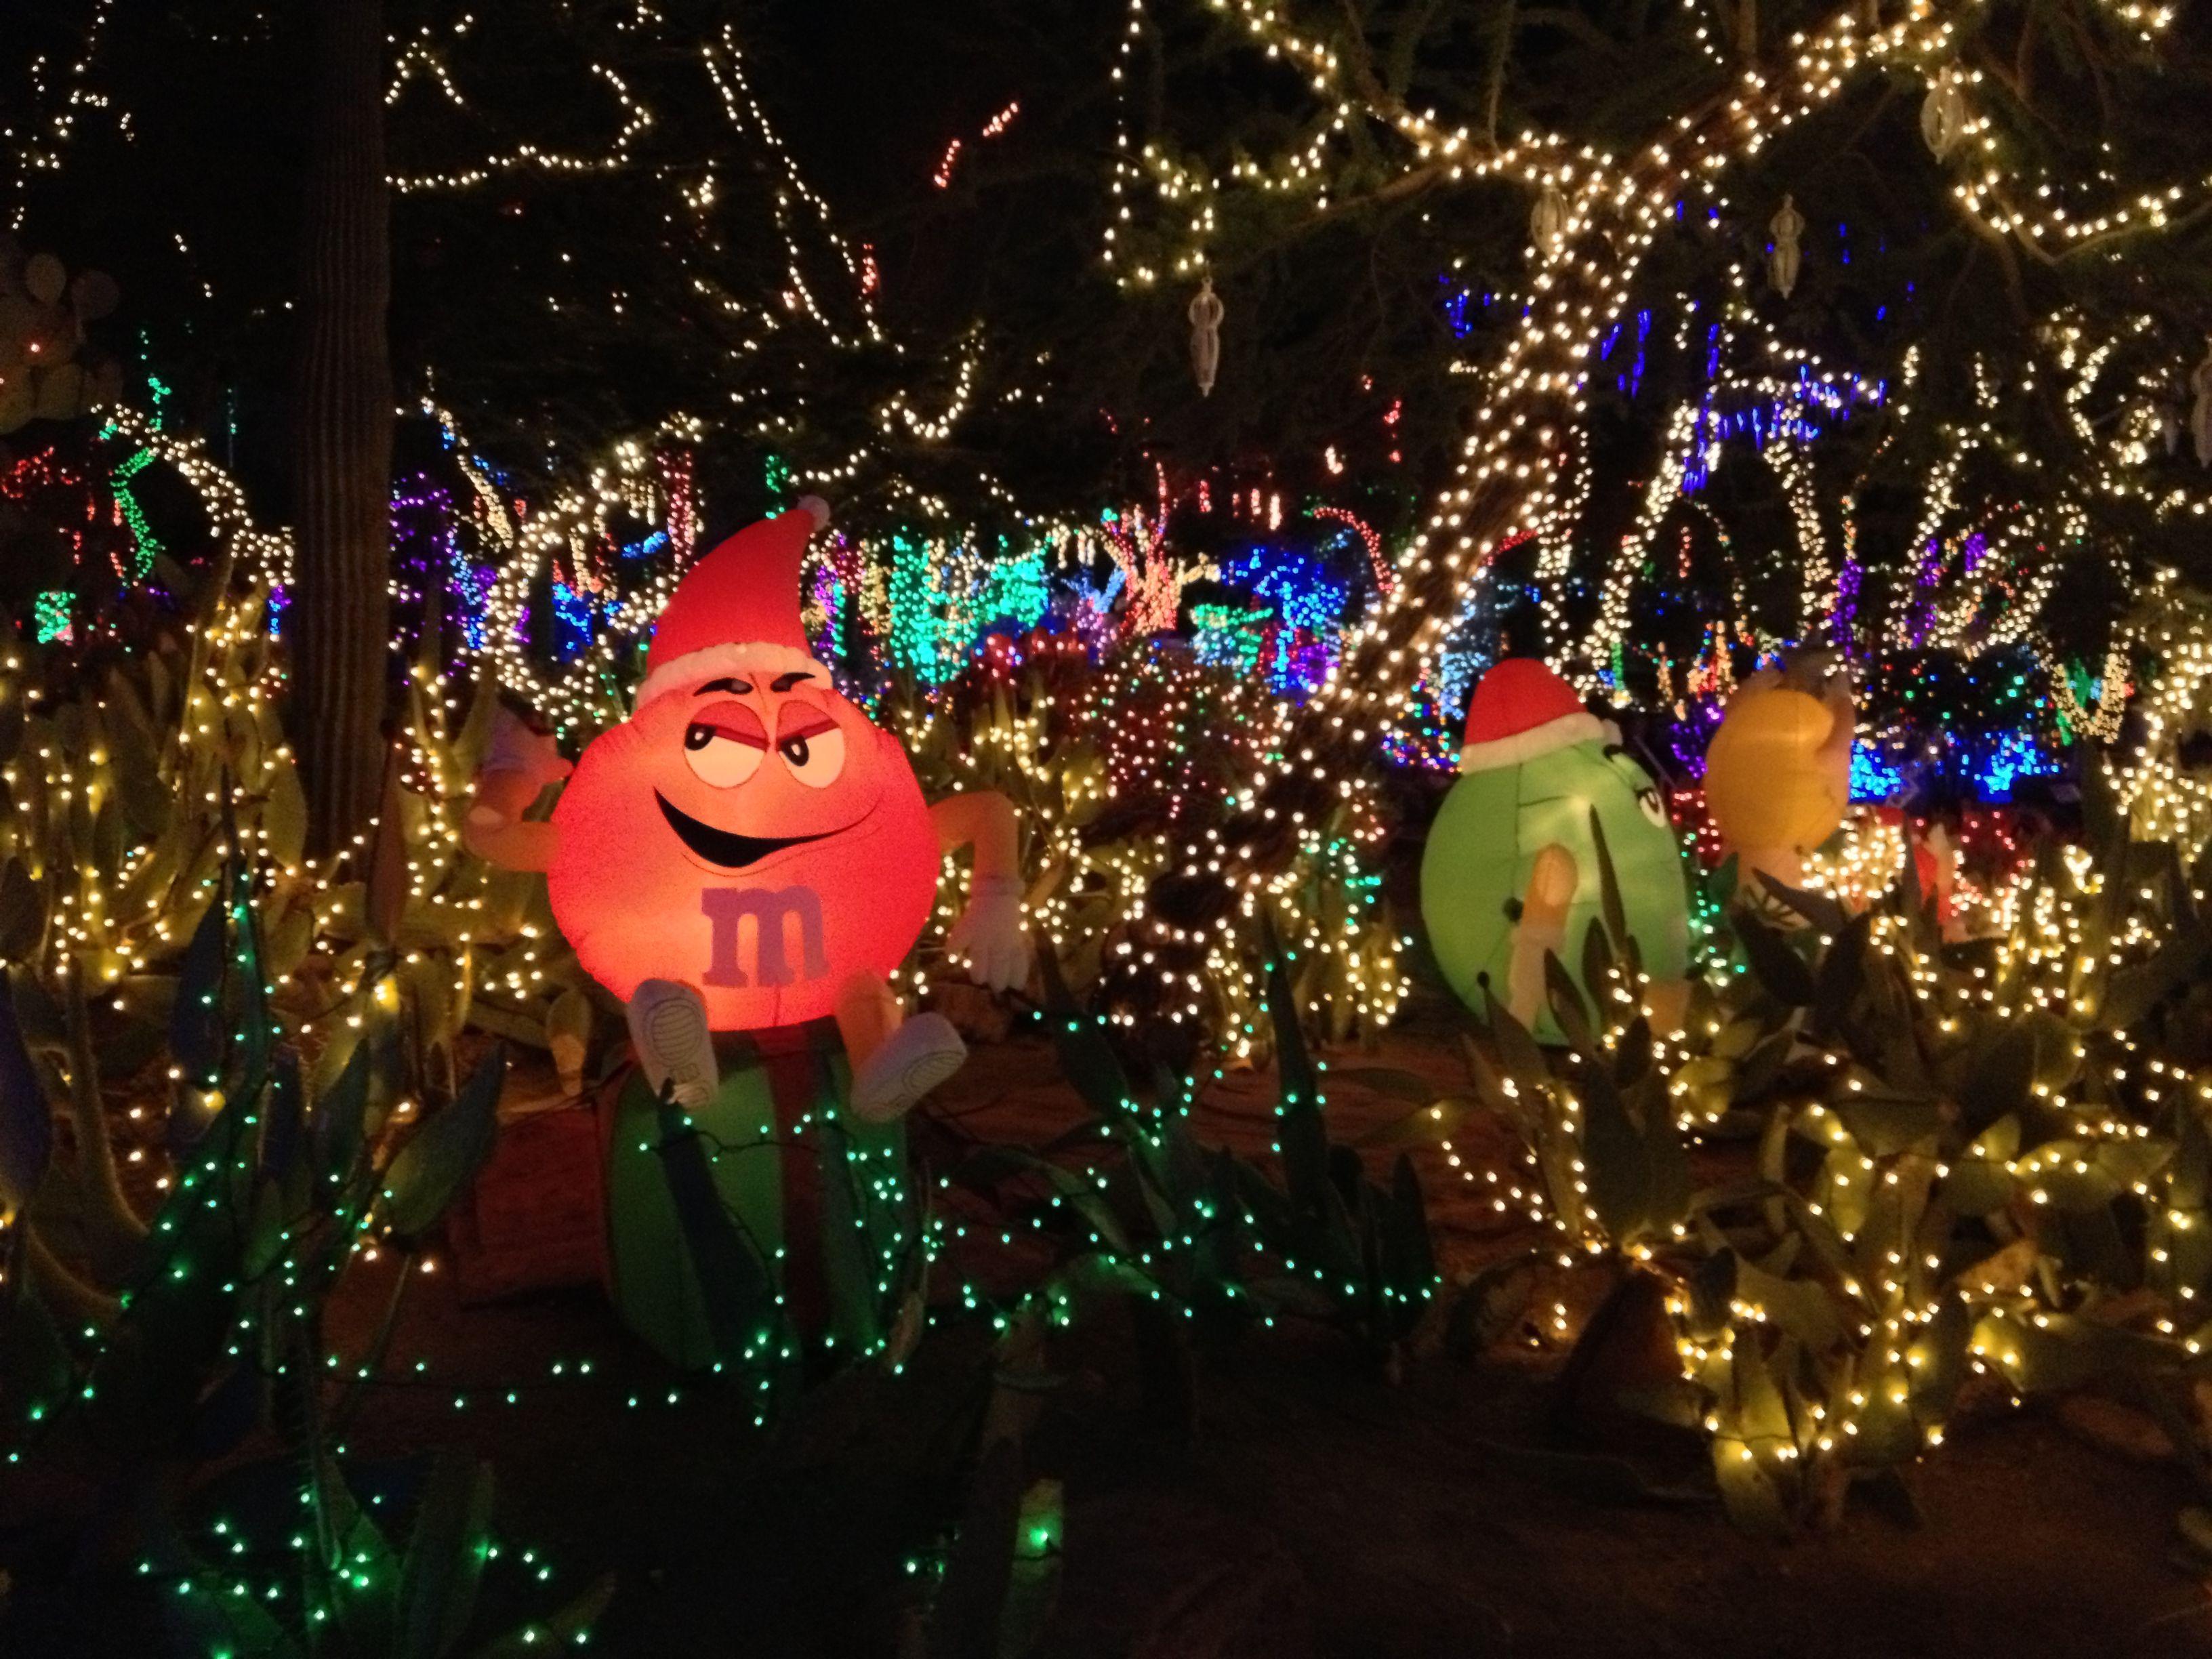 Ethel M's Cactus Garden, Henderson, NV Christmas lights